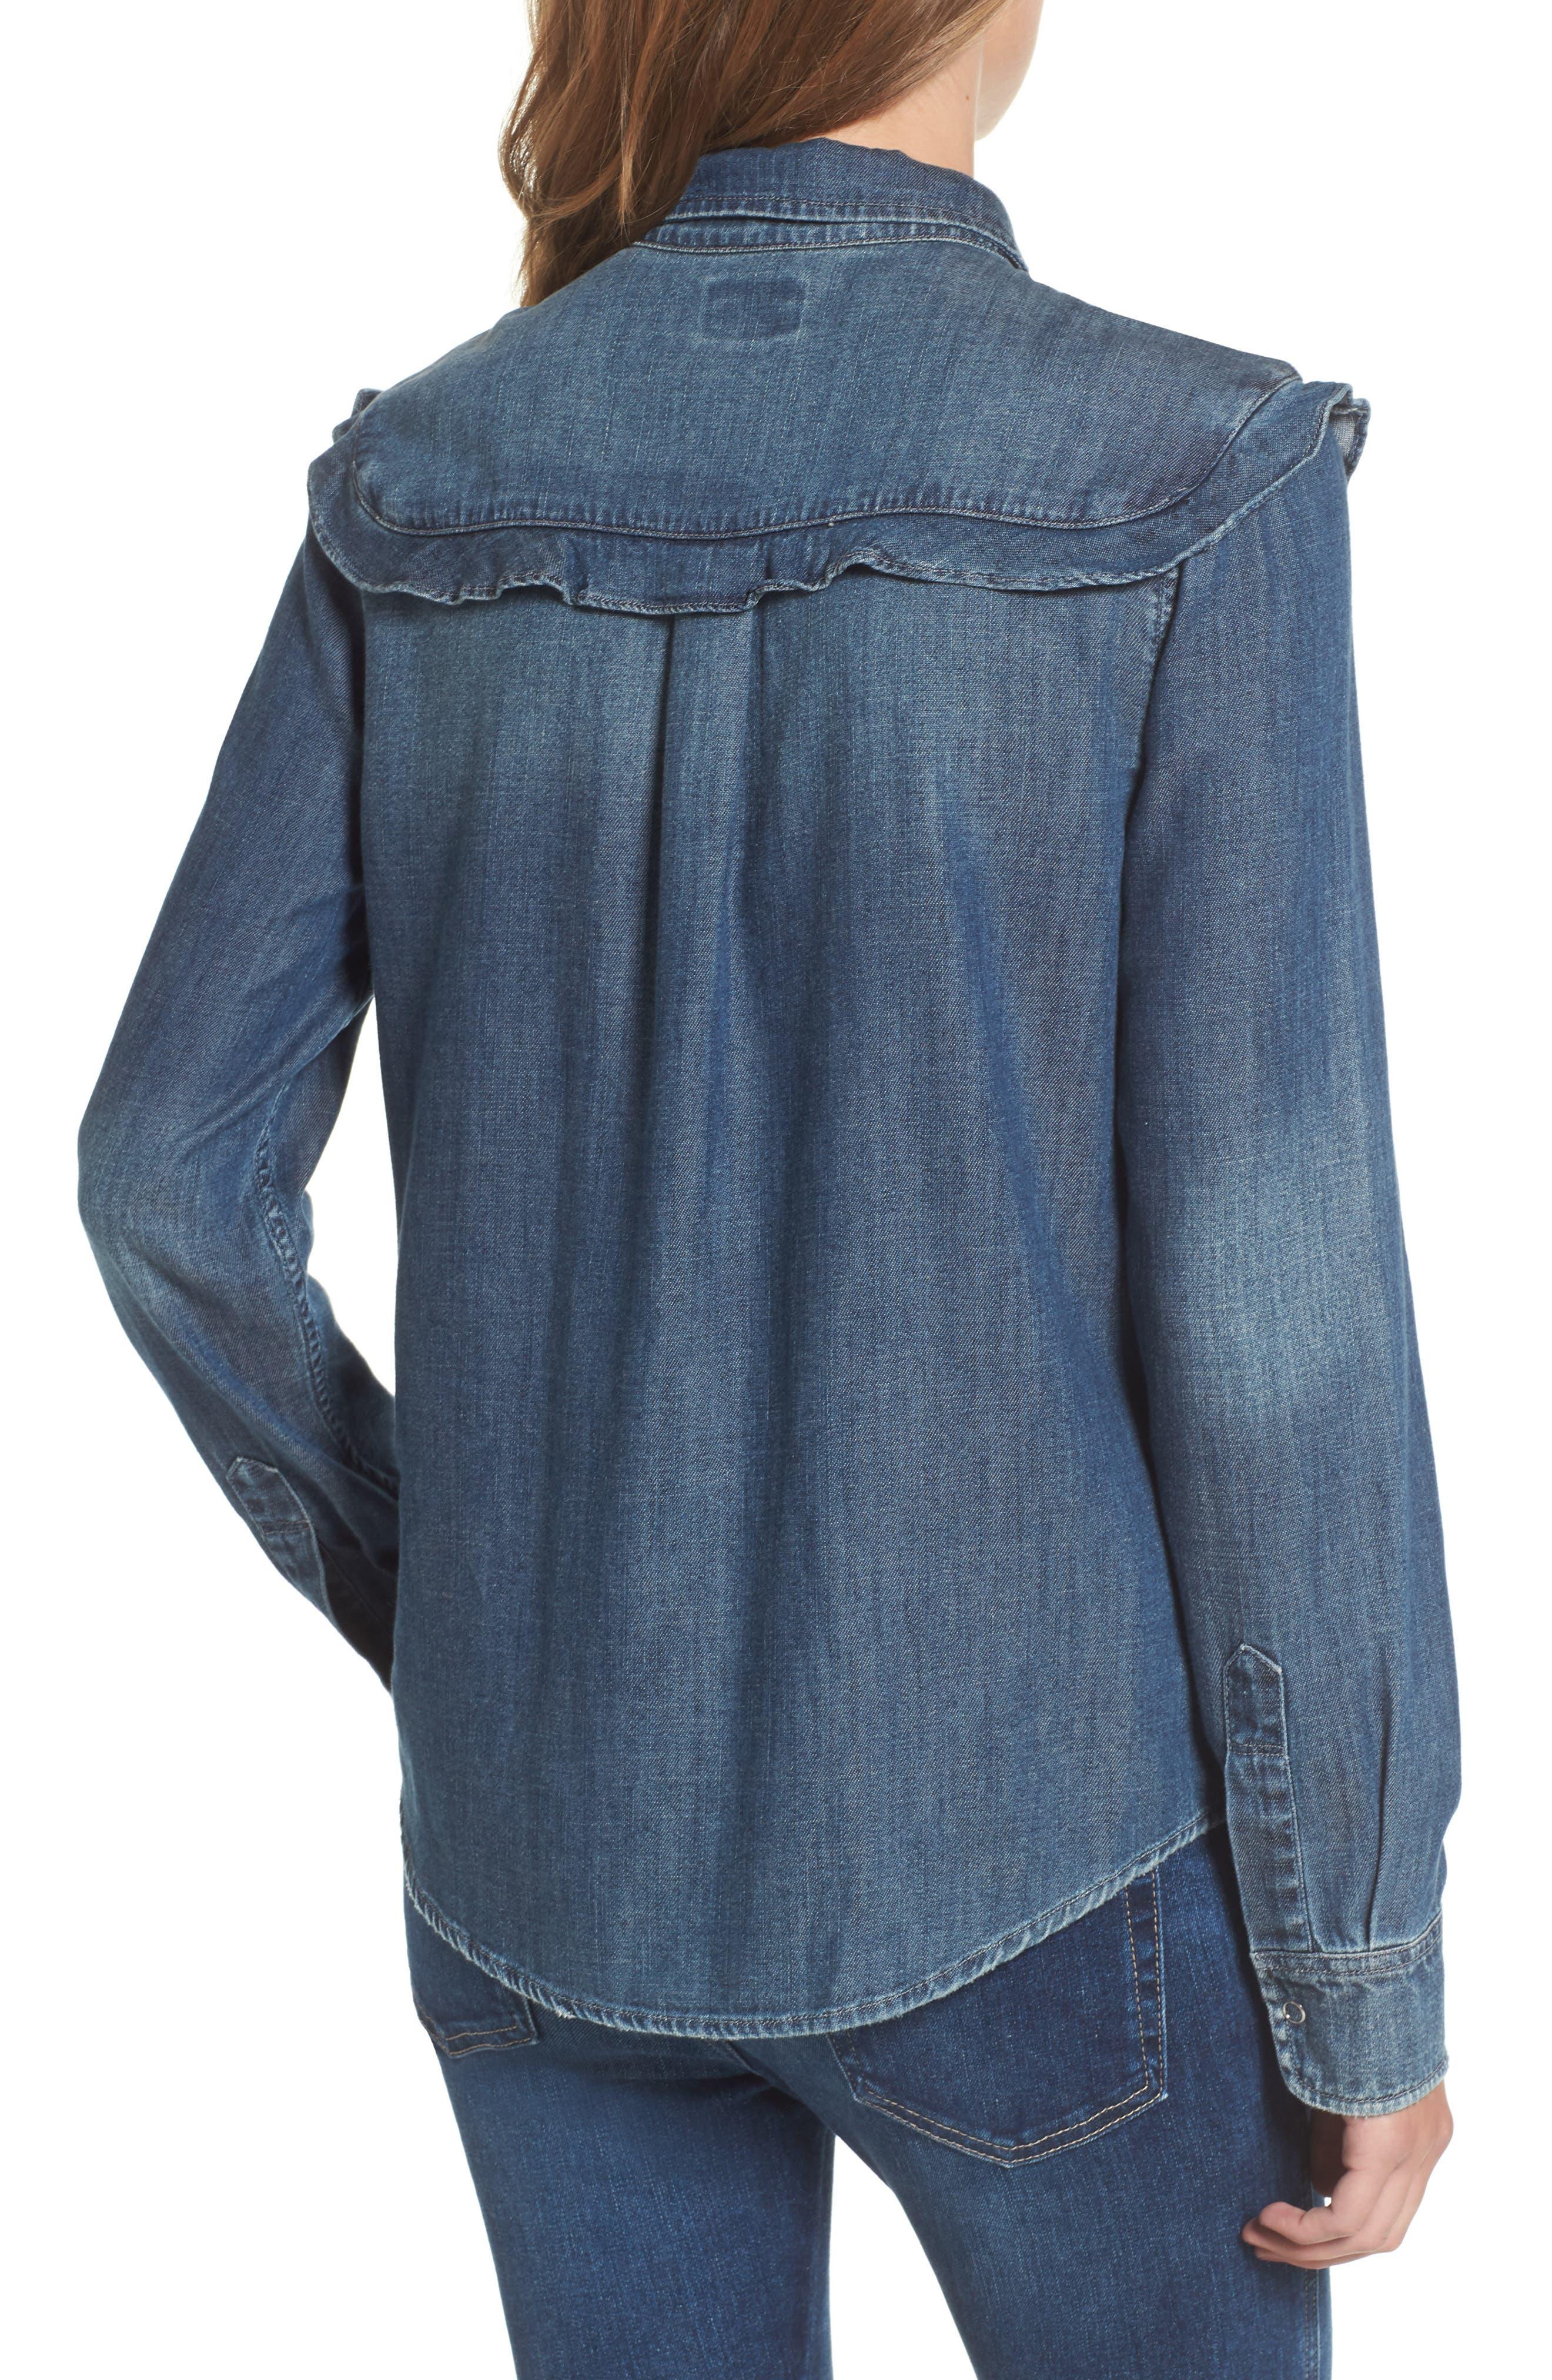 Joanna Ruffle Denim Shirt,                             Alternate thumbnail 2, color,                             412